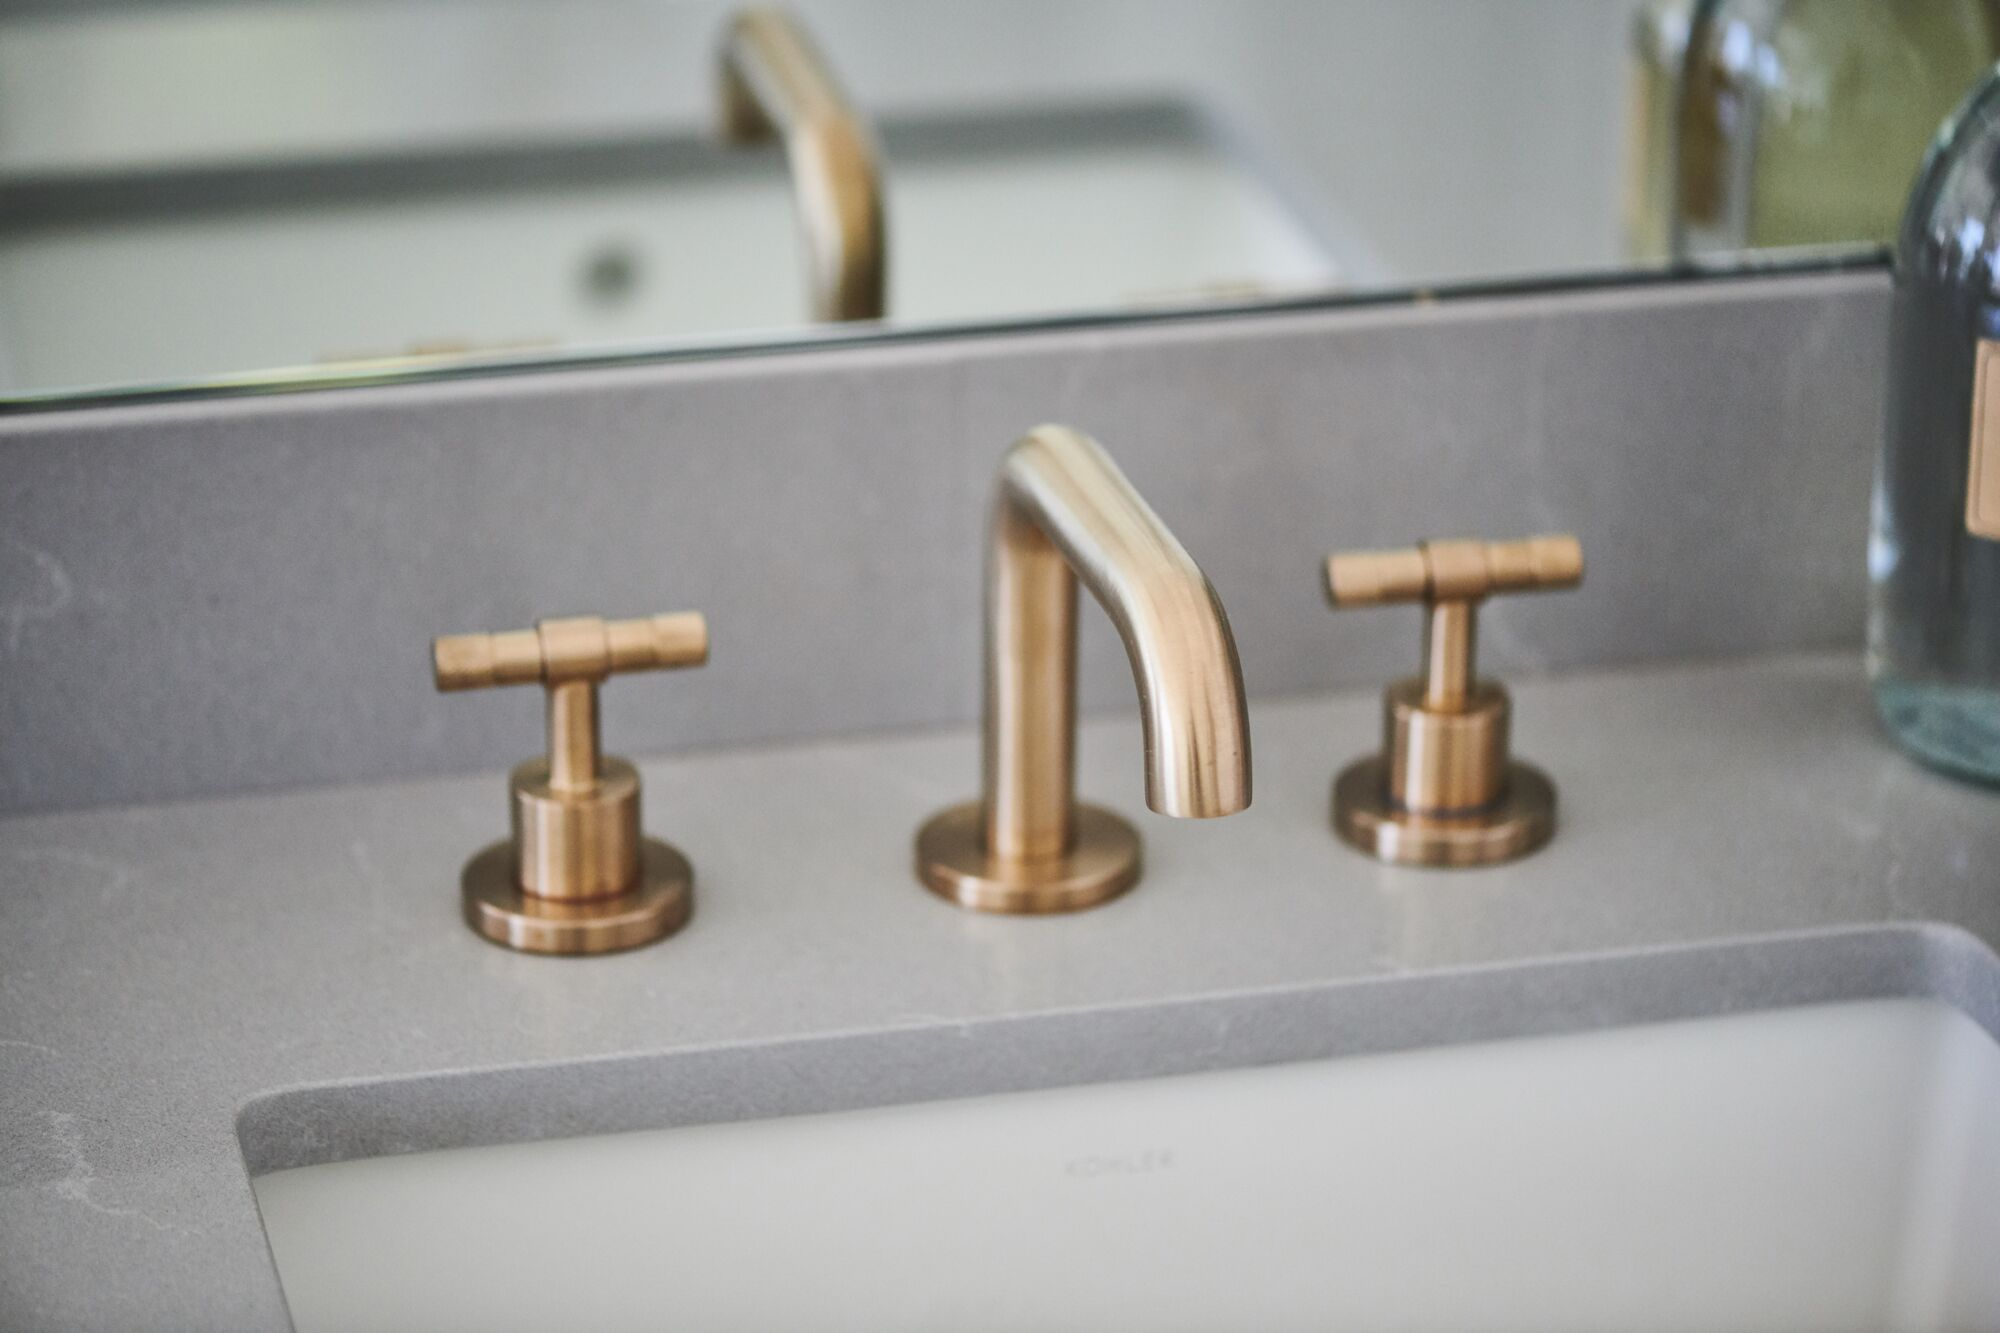 Master faucet - Princess Anne.jpg